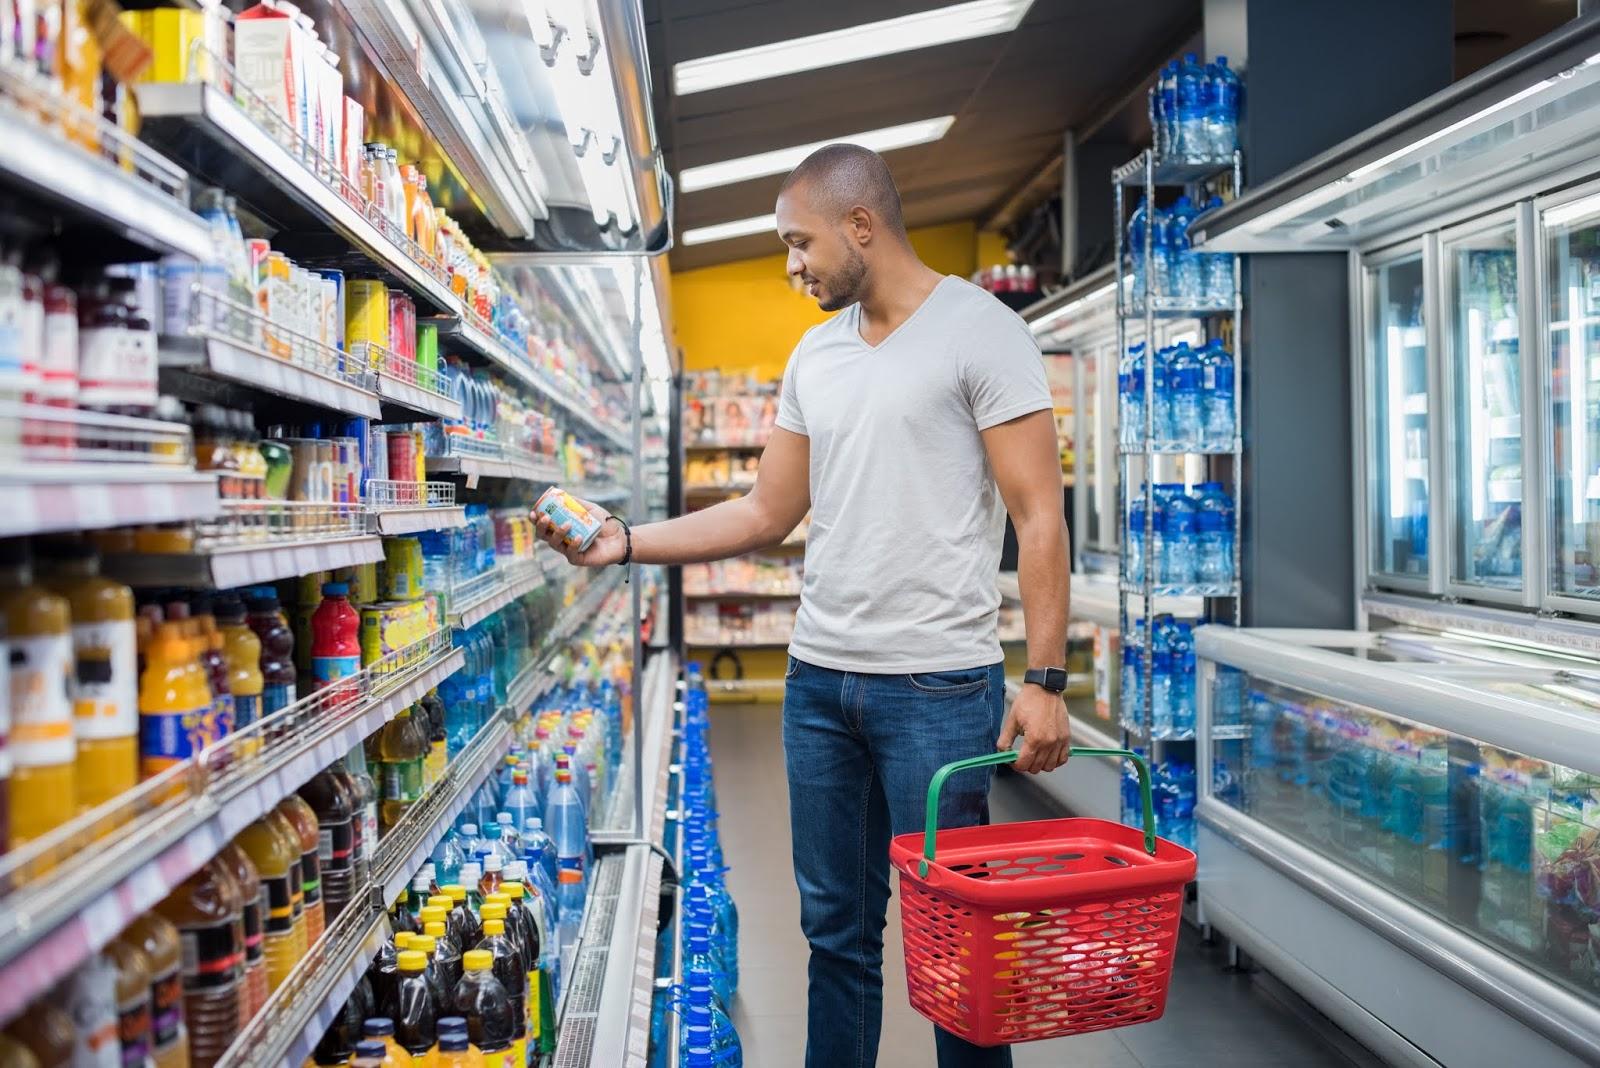 Interpreting food labels